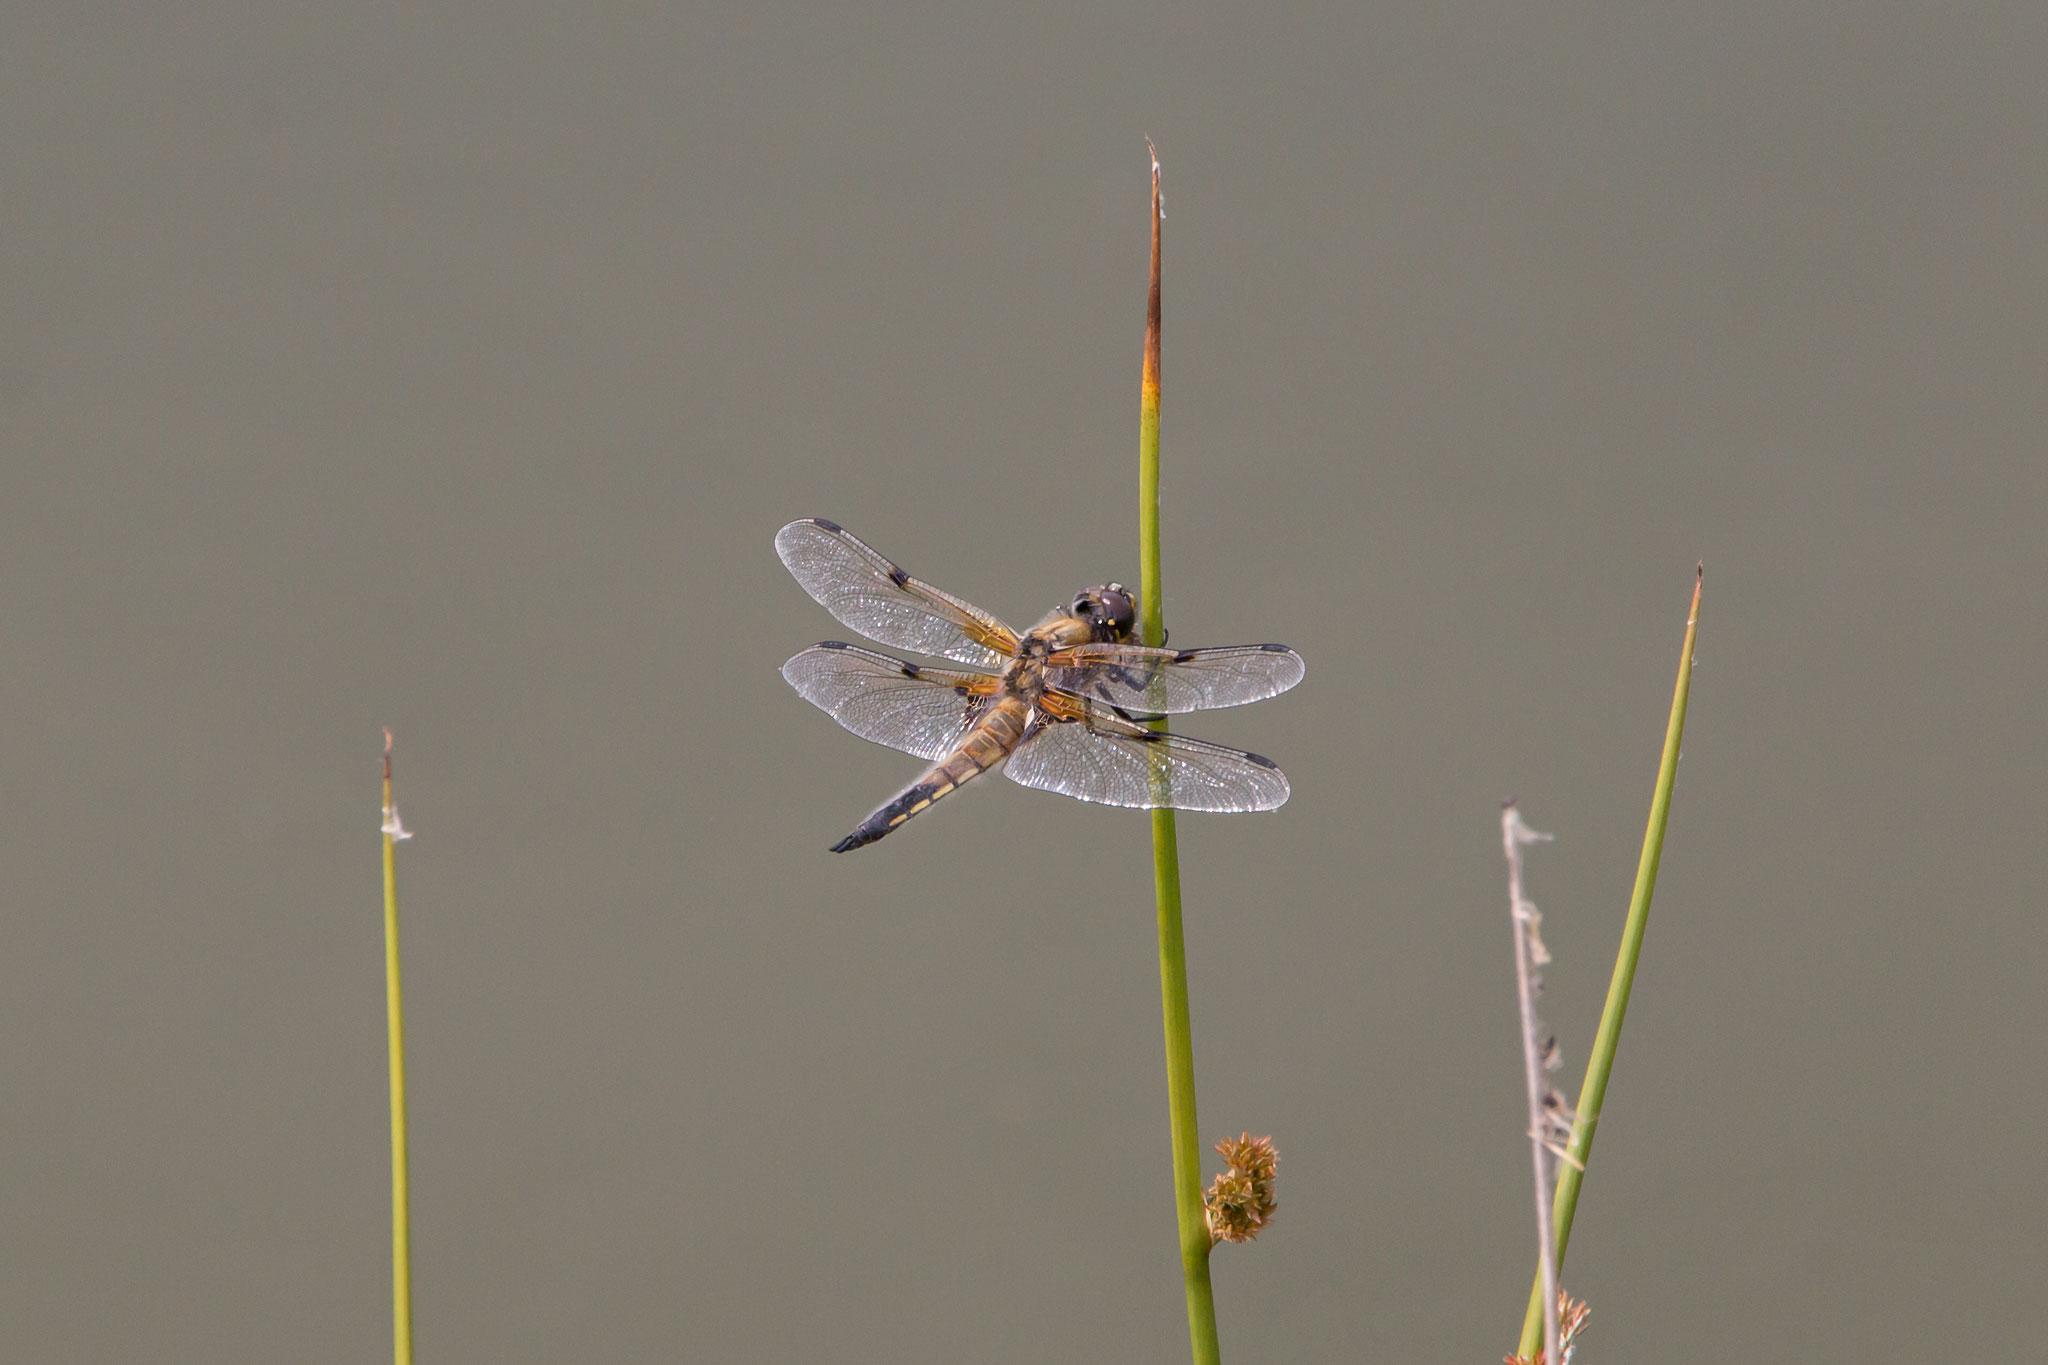 Ein Vierfleck (Libellula quadrimaculata) auf Sitzwarte (Foto: Rea Brinkhoff)